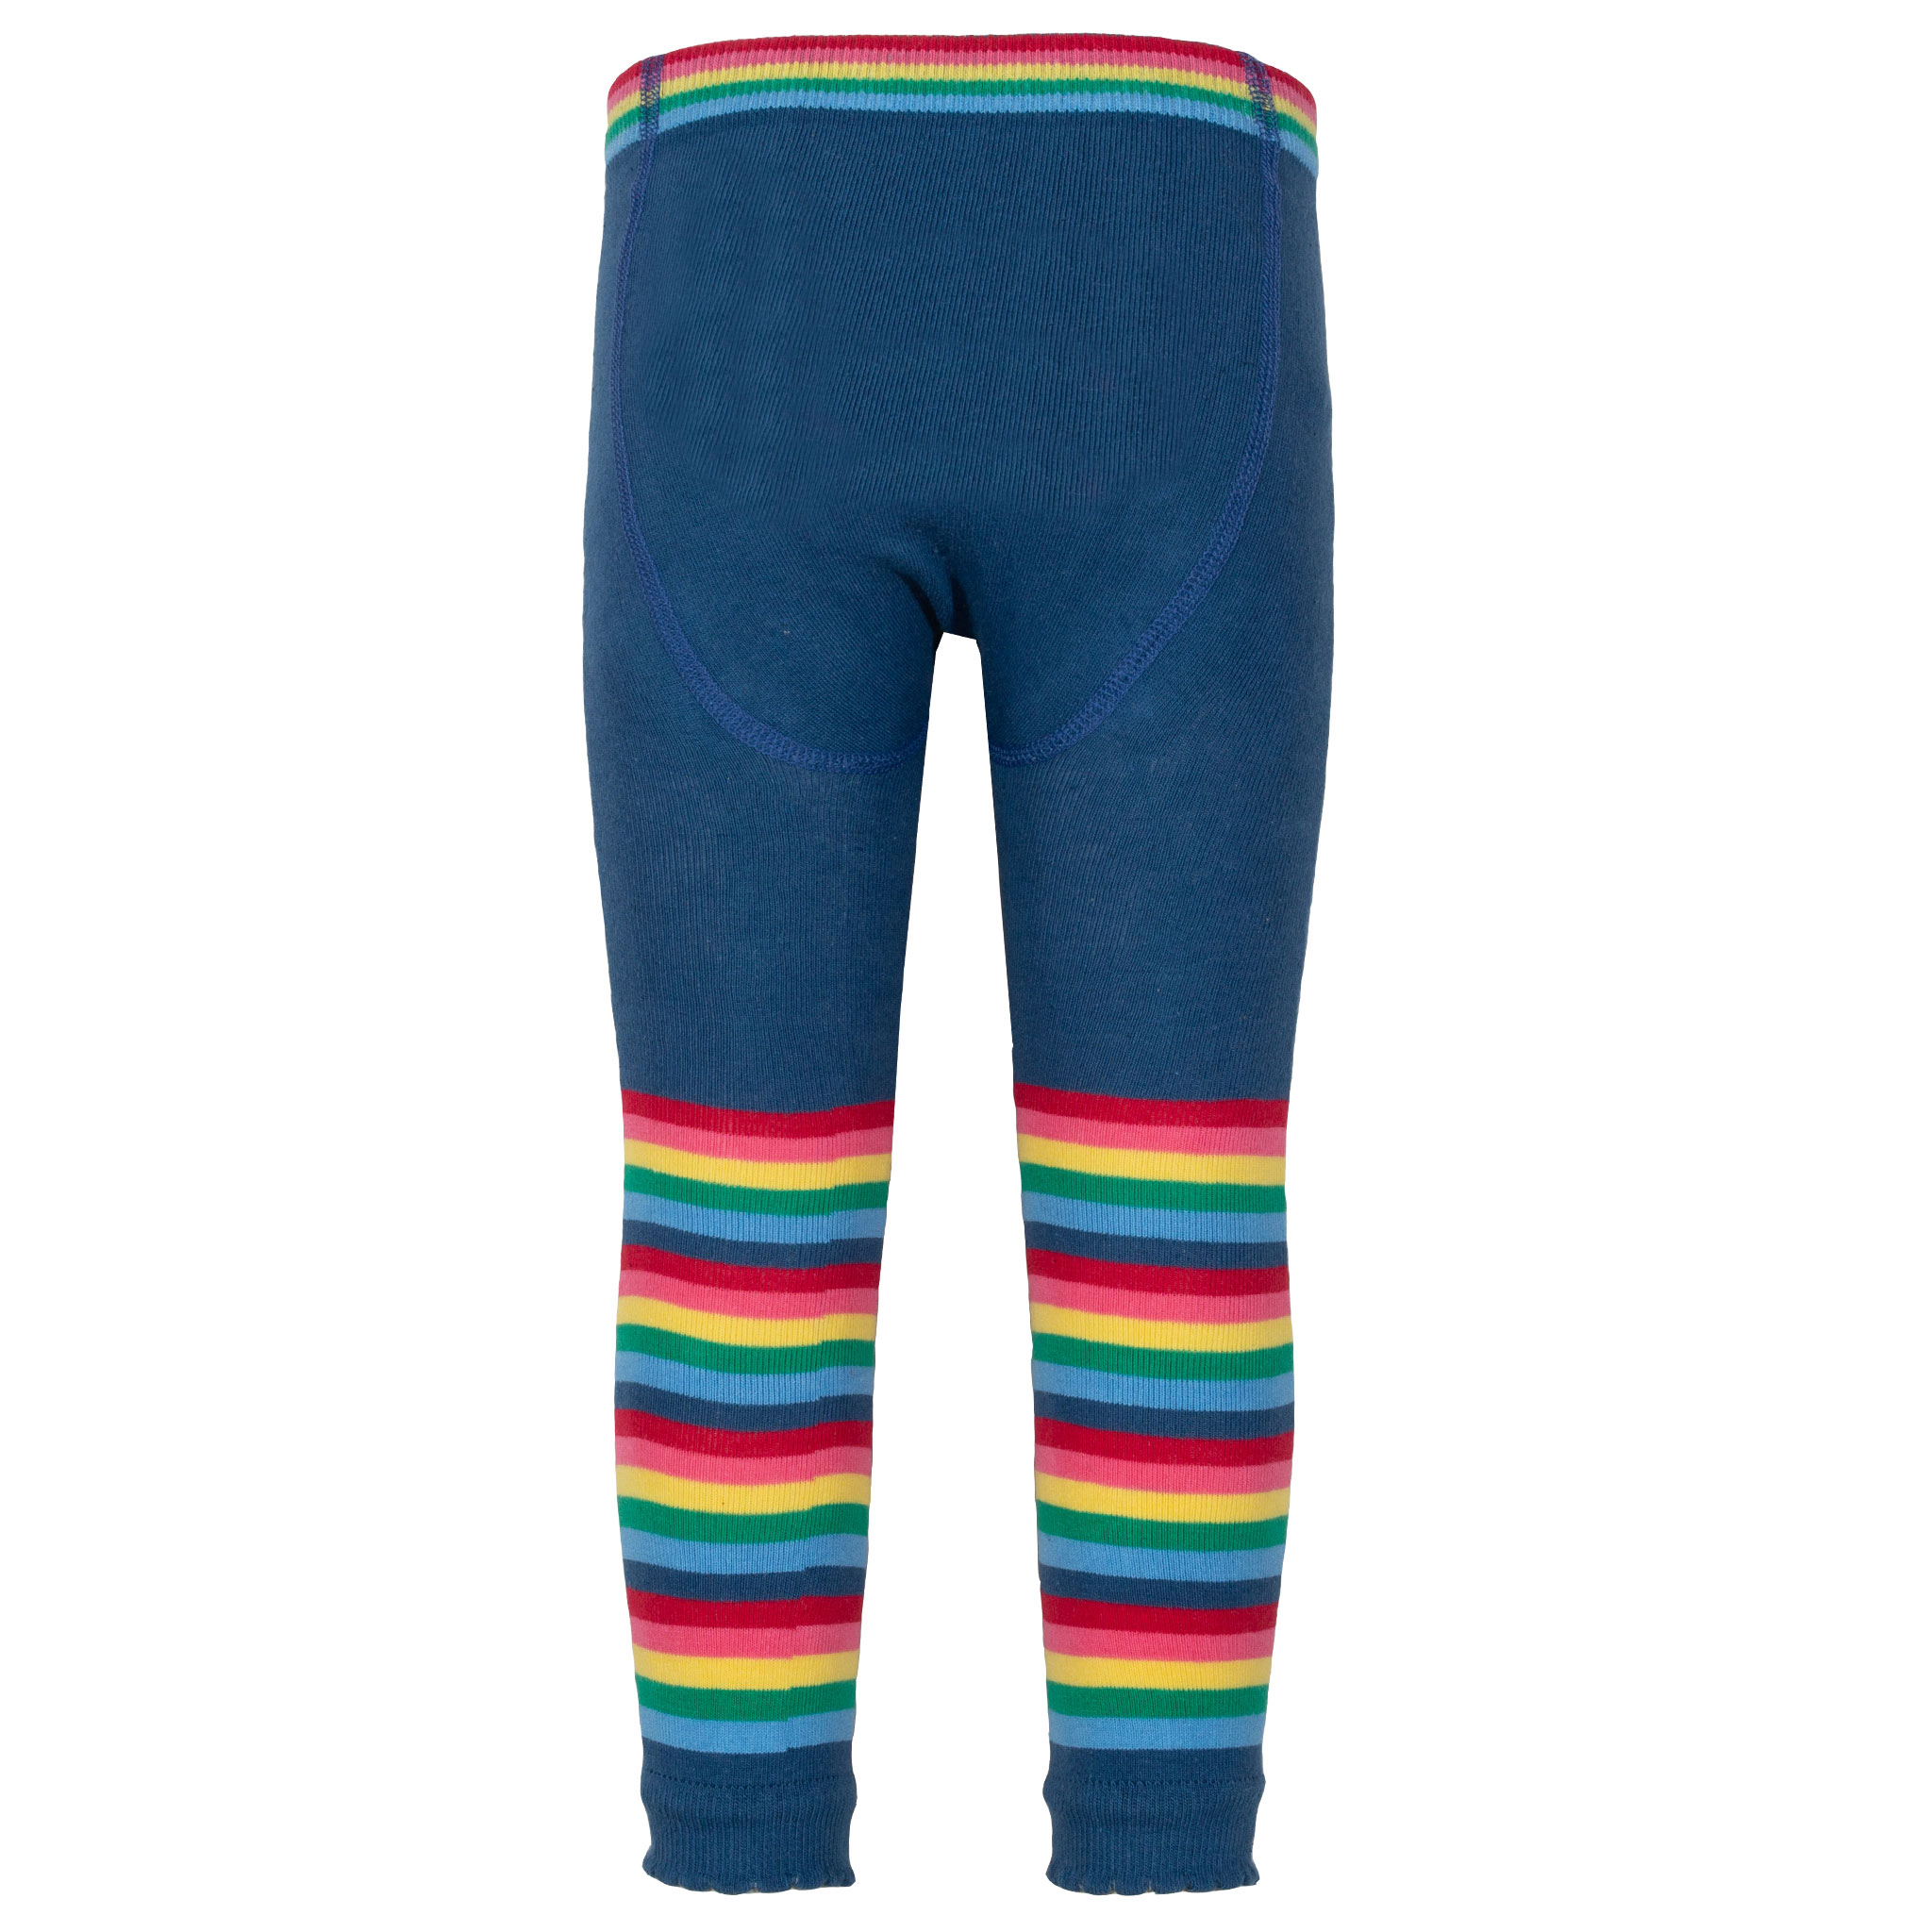 Kite Stripy Knit Leggings